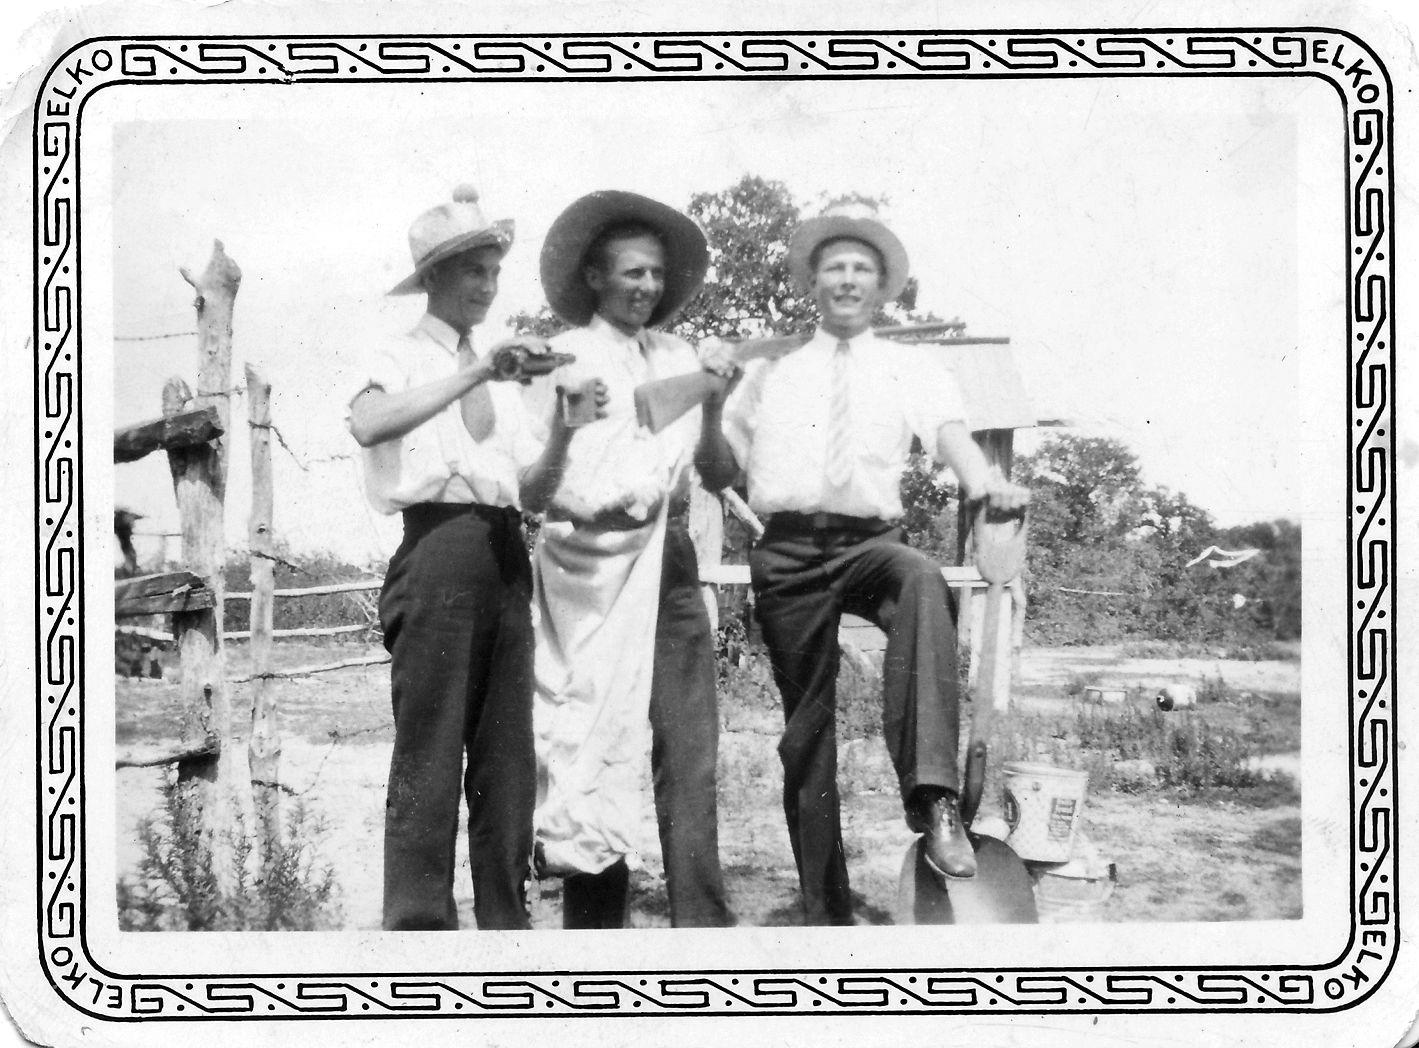 Harry Okonski, Lee Yazak, Steve Okonski  Bremond, TX 1930's